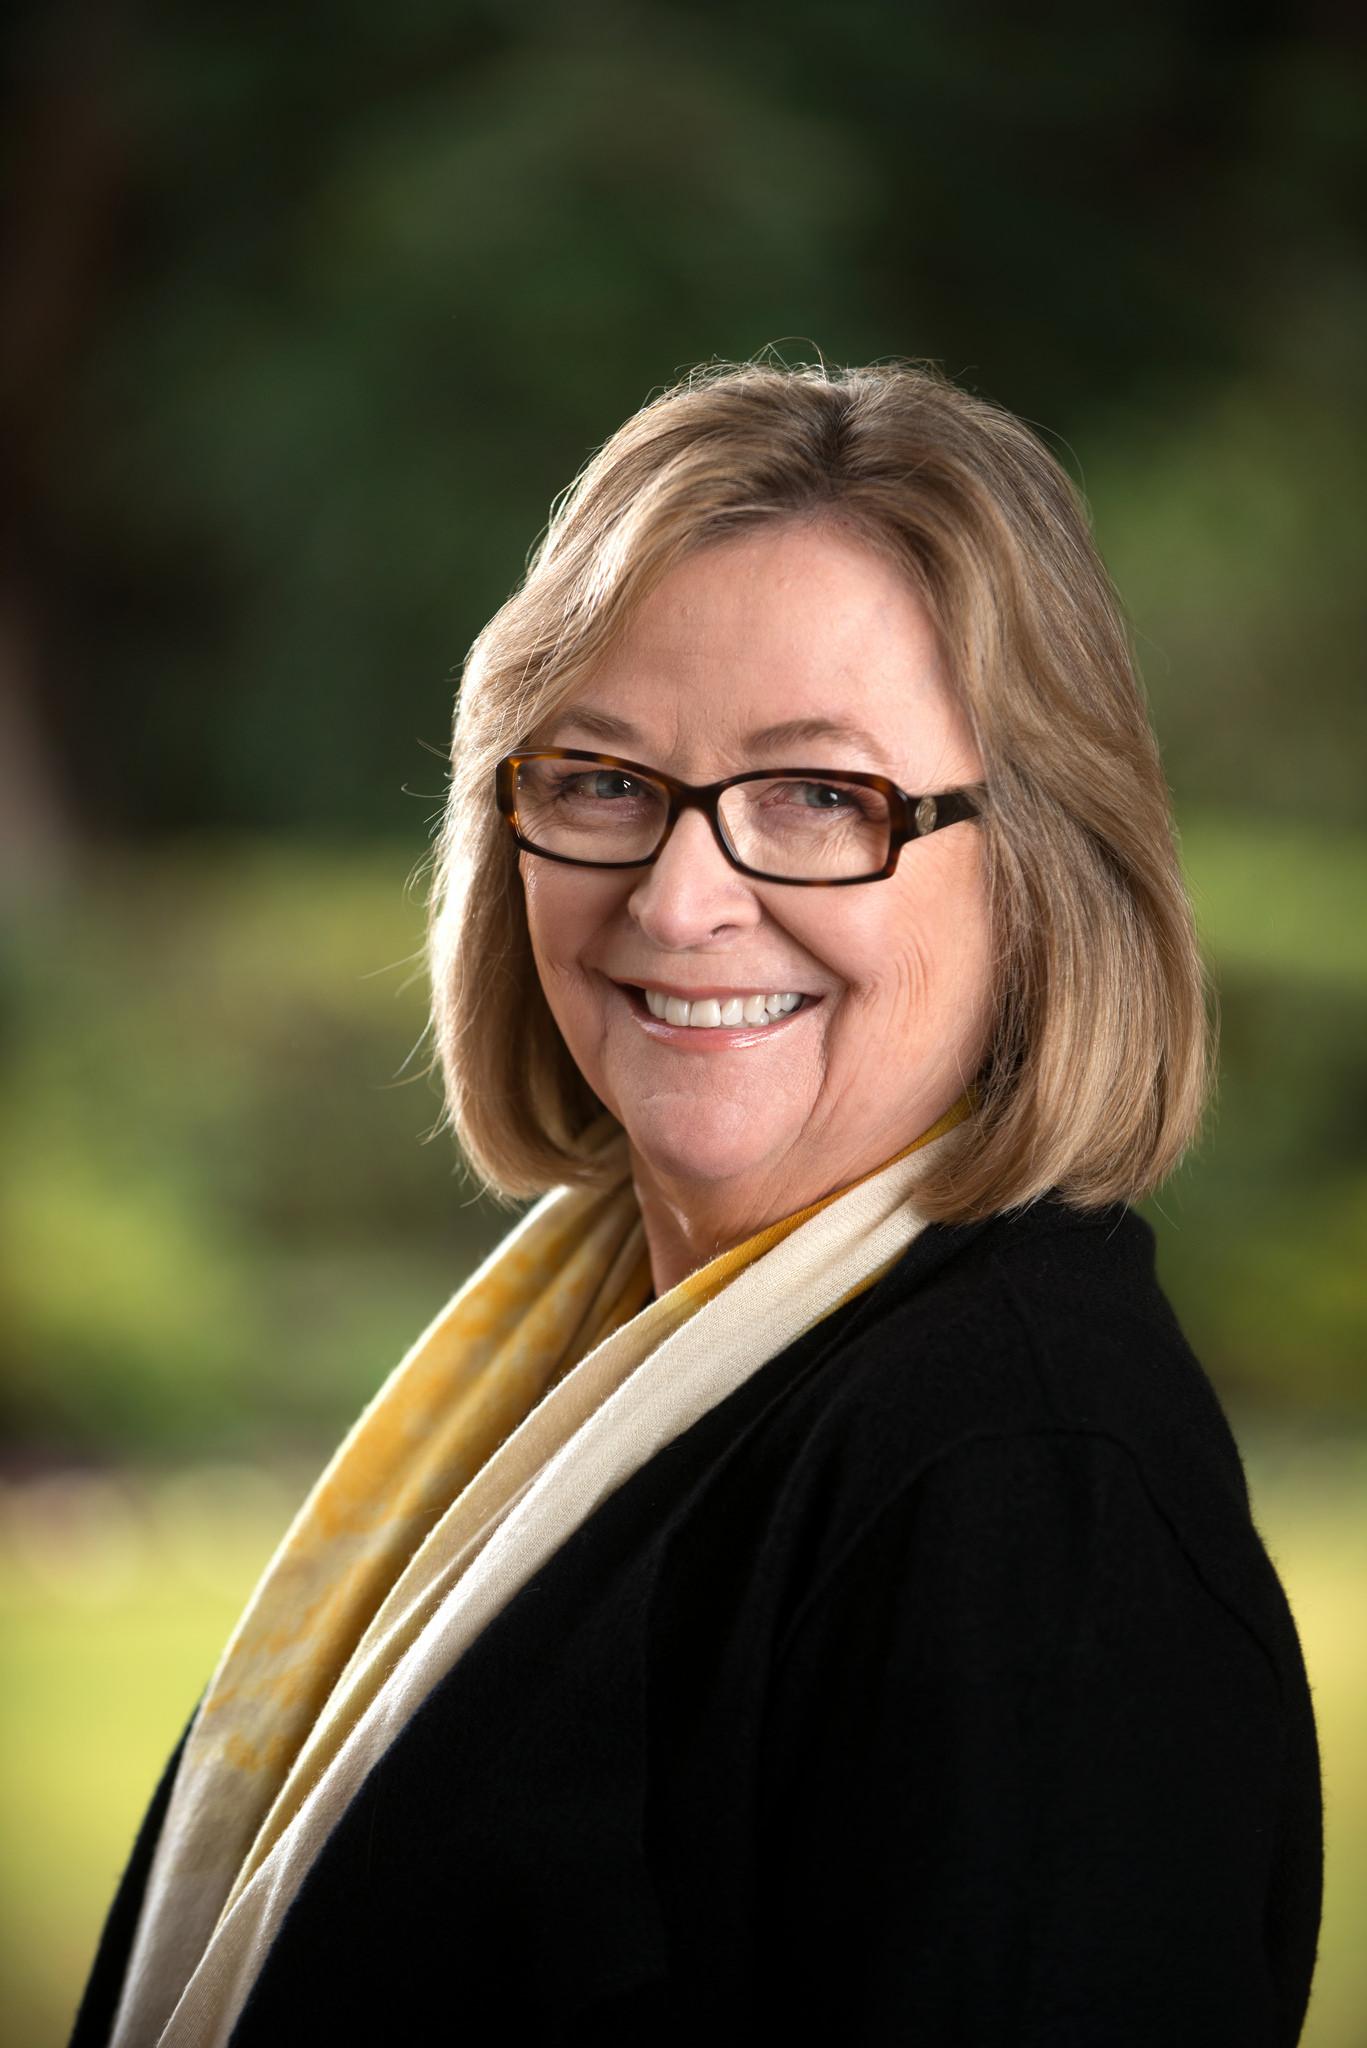 Dr. Jane Close Conoley, President, CSULB